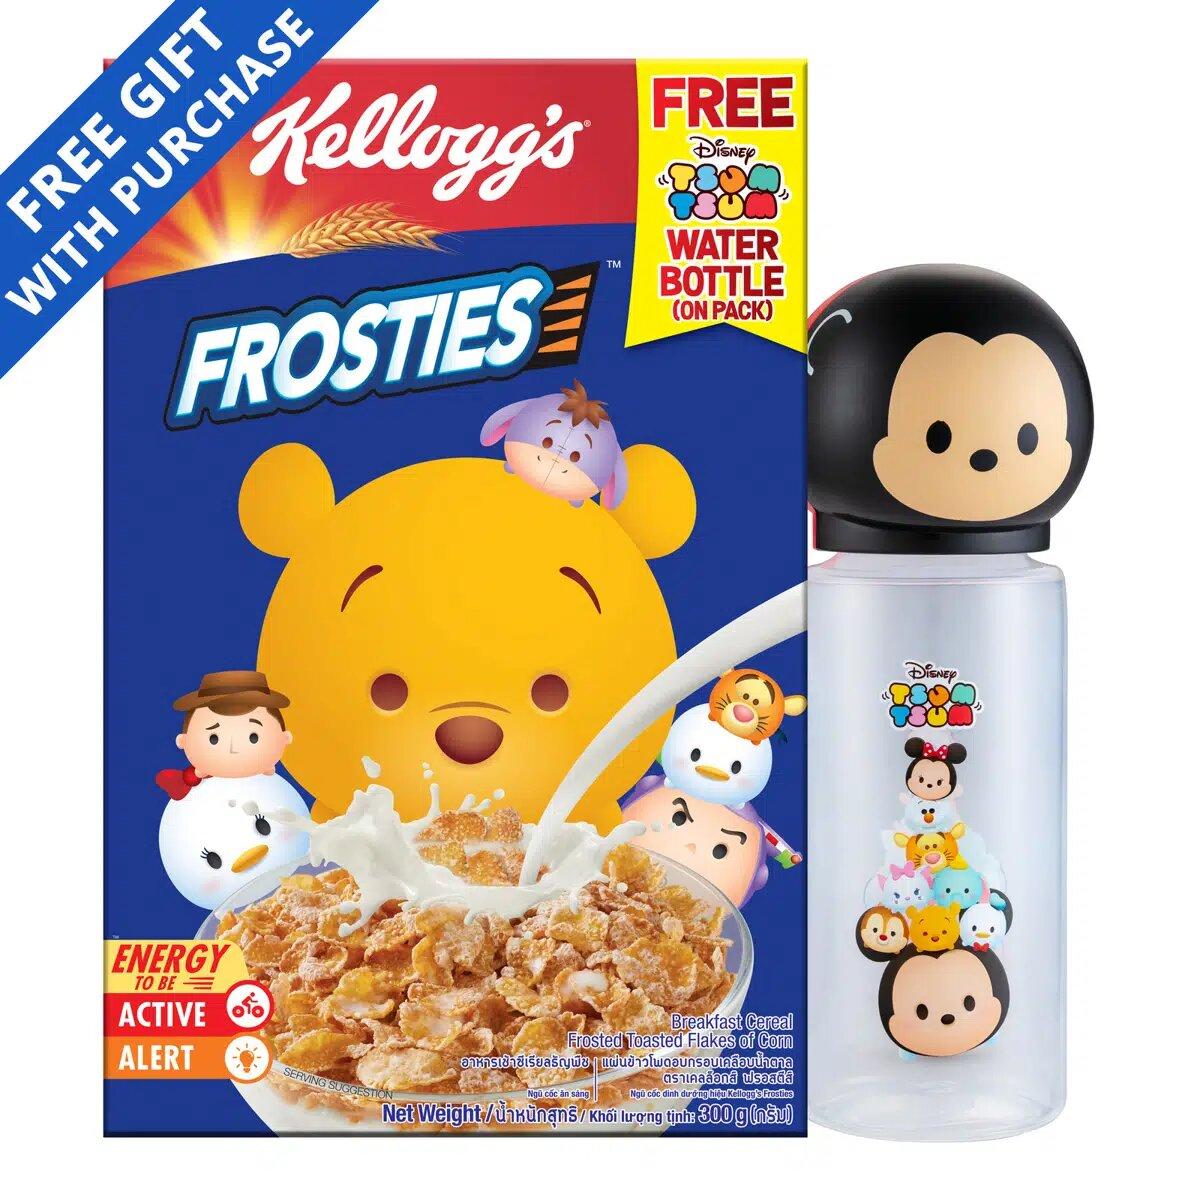 Kellogg's Cereal - Frosties + Free Tsum Water Bottle